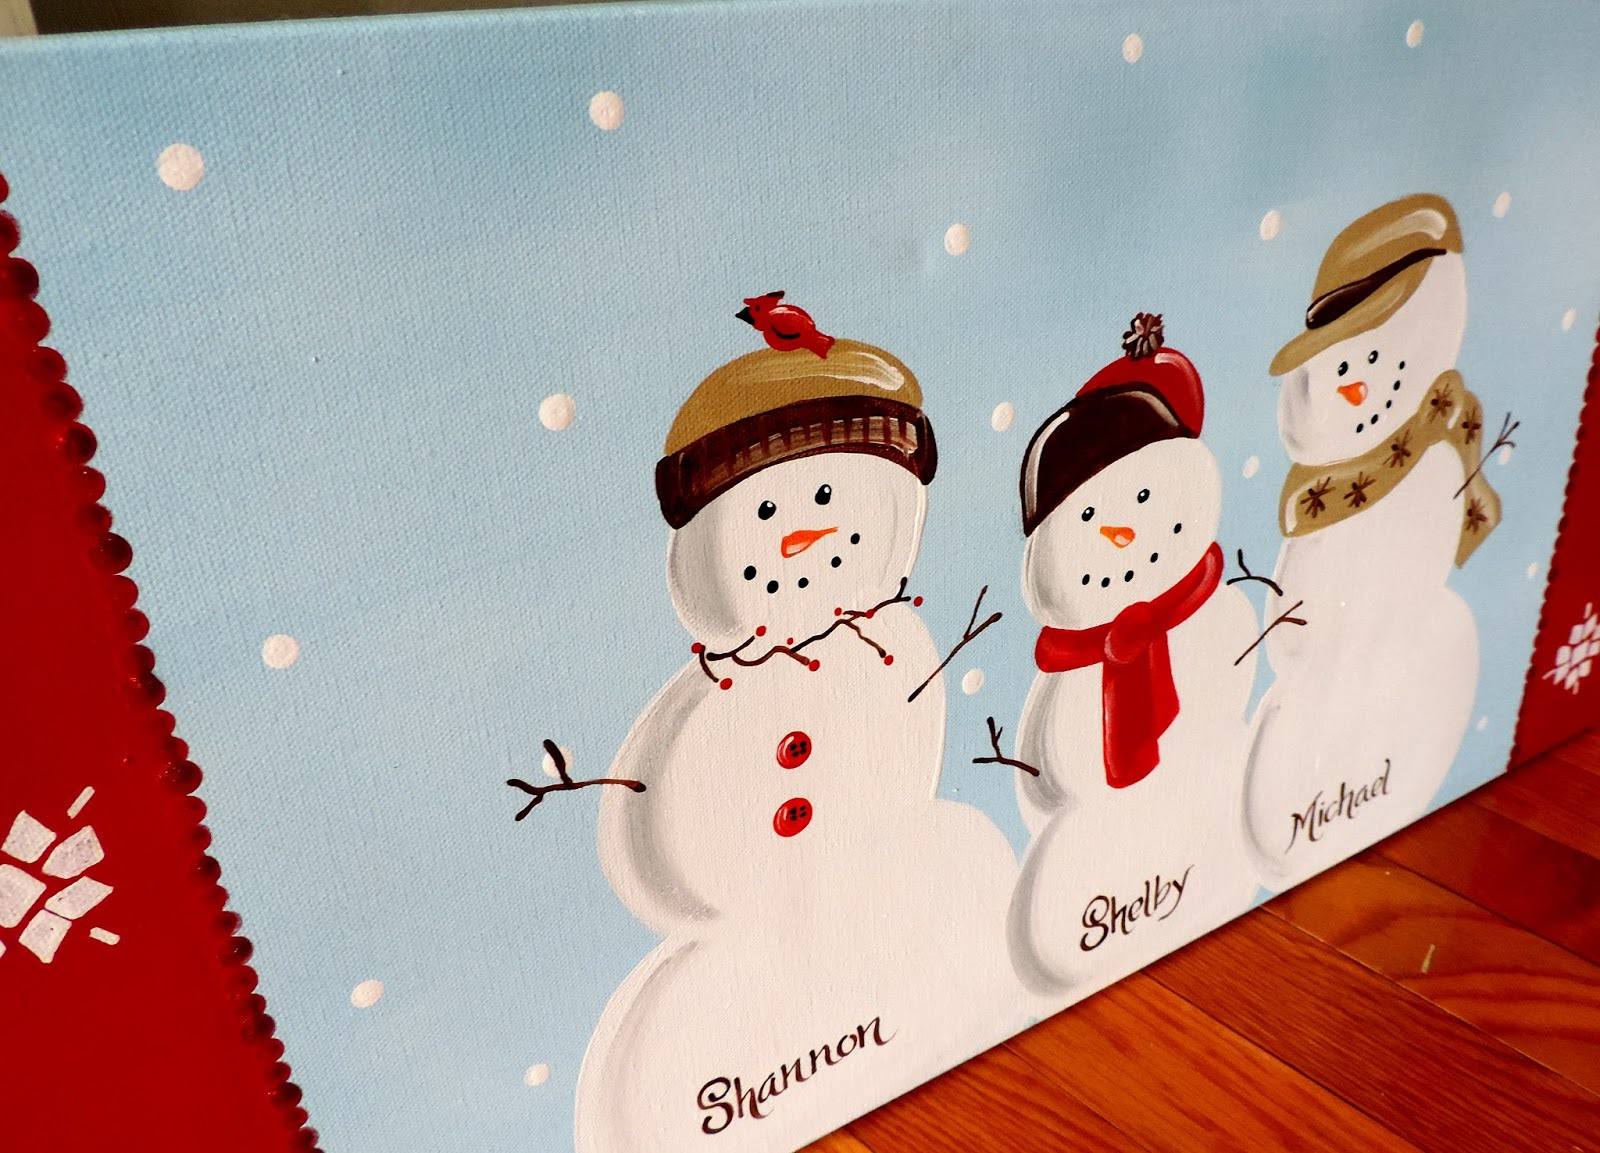 Snowman Family - 12x24 - $50.00